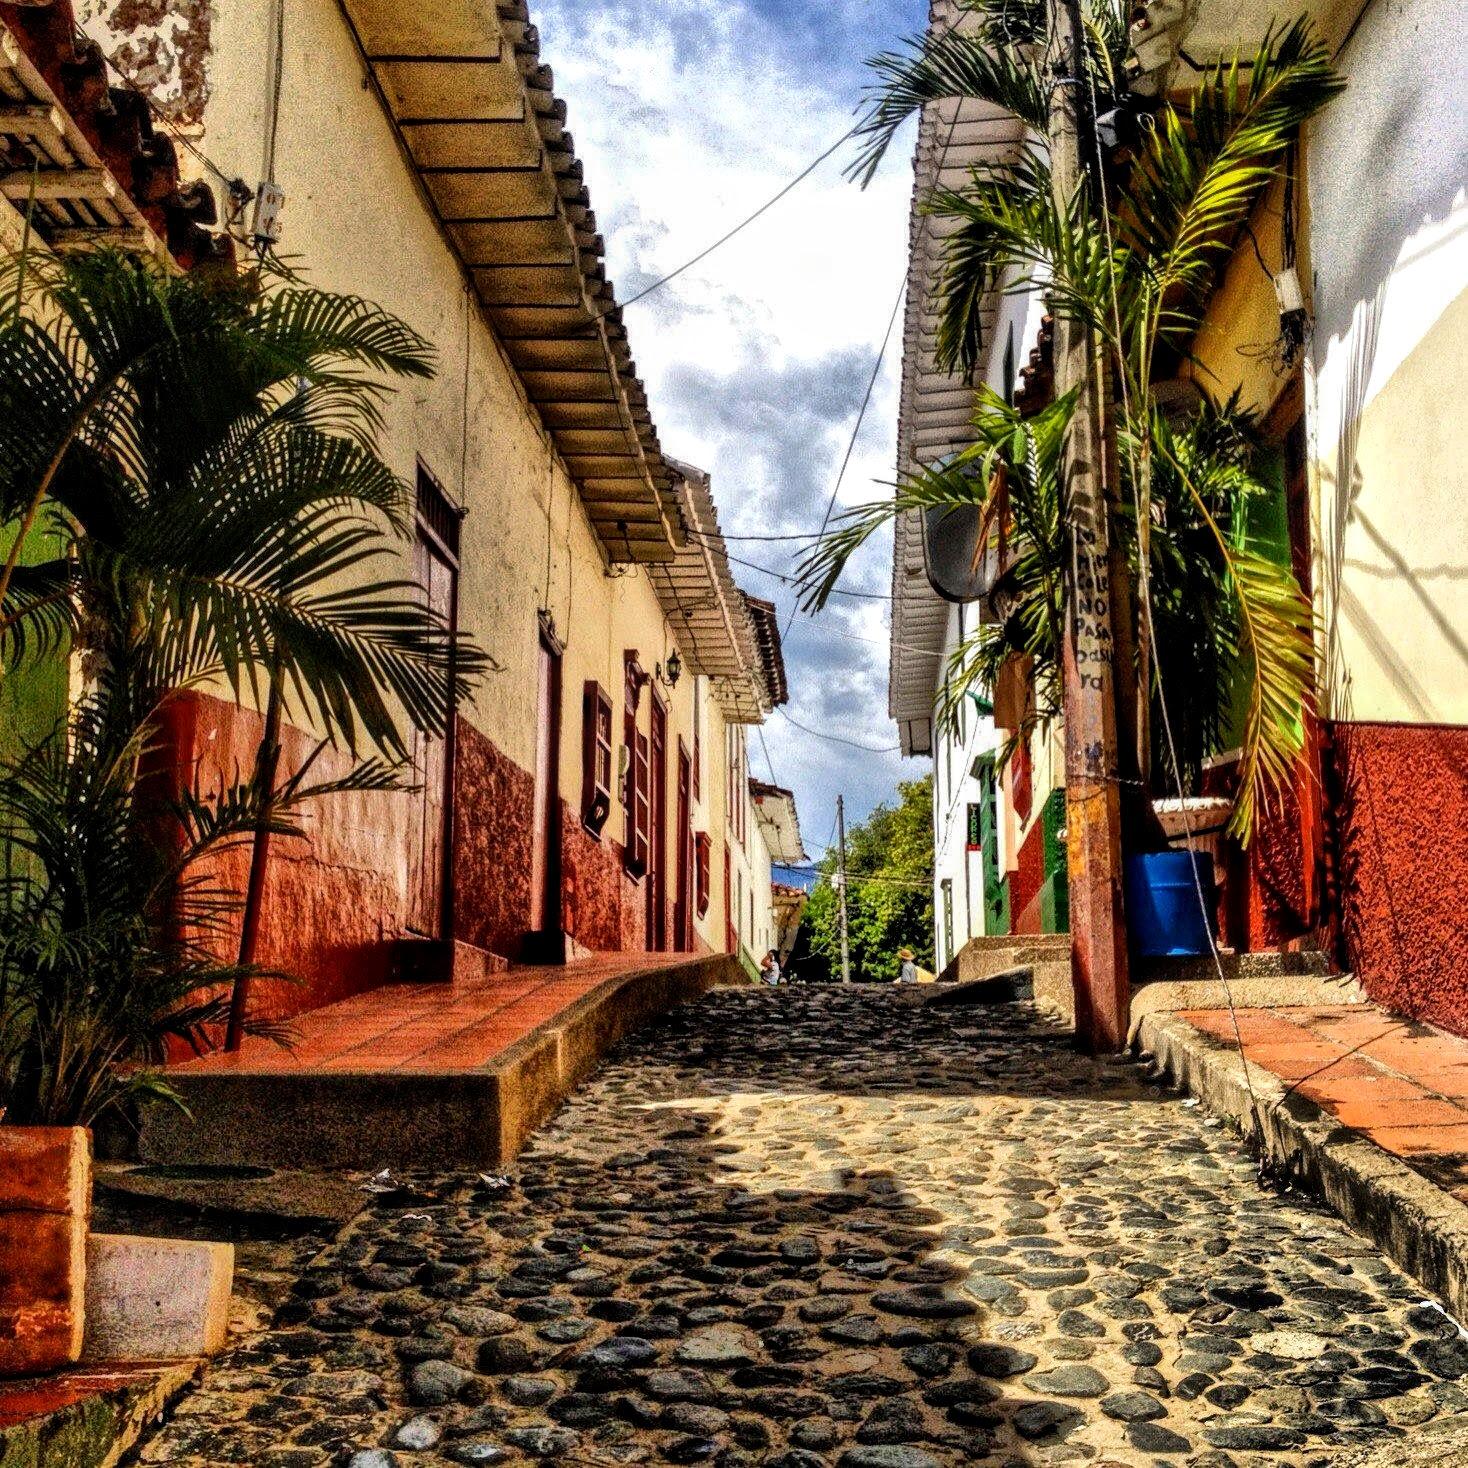 Cobblestone streets Santa Fe de Antioquia